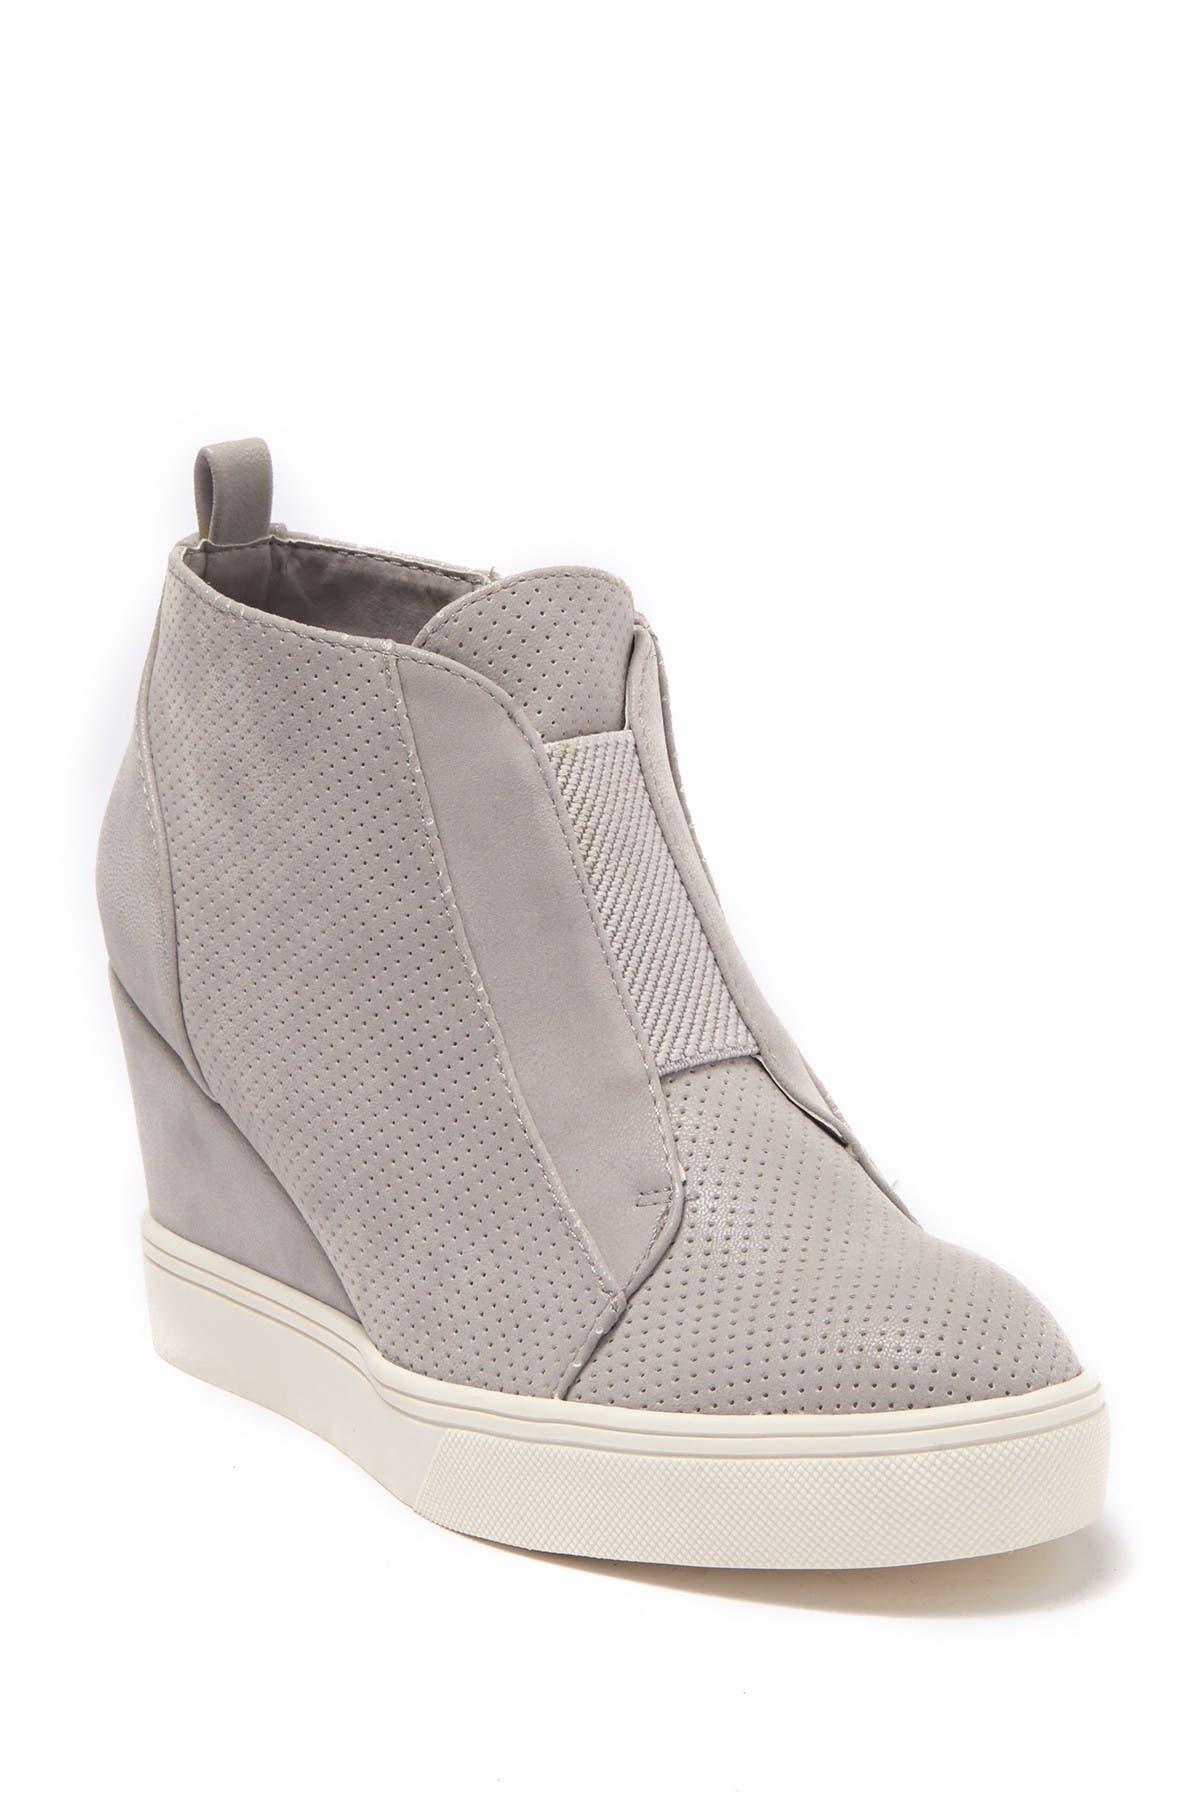 Image of MIA Cristie Wedge Sneaker